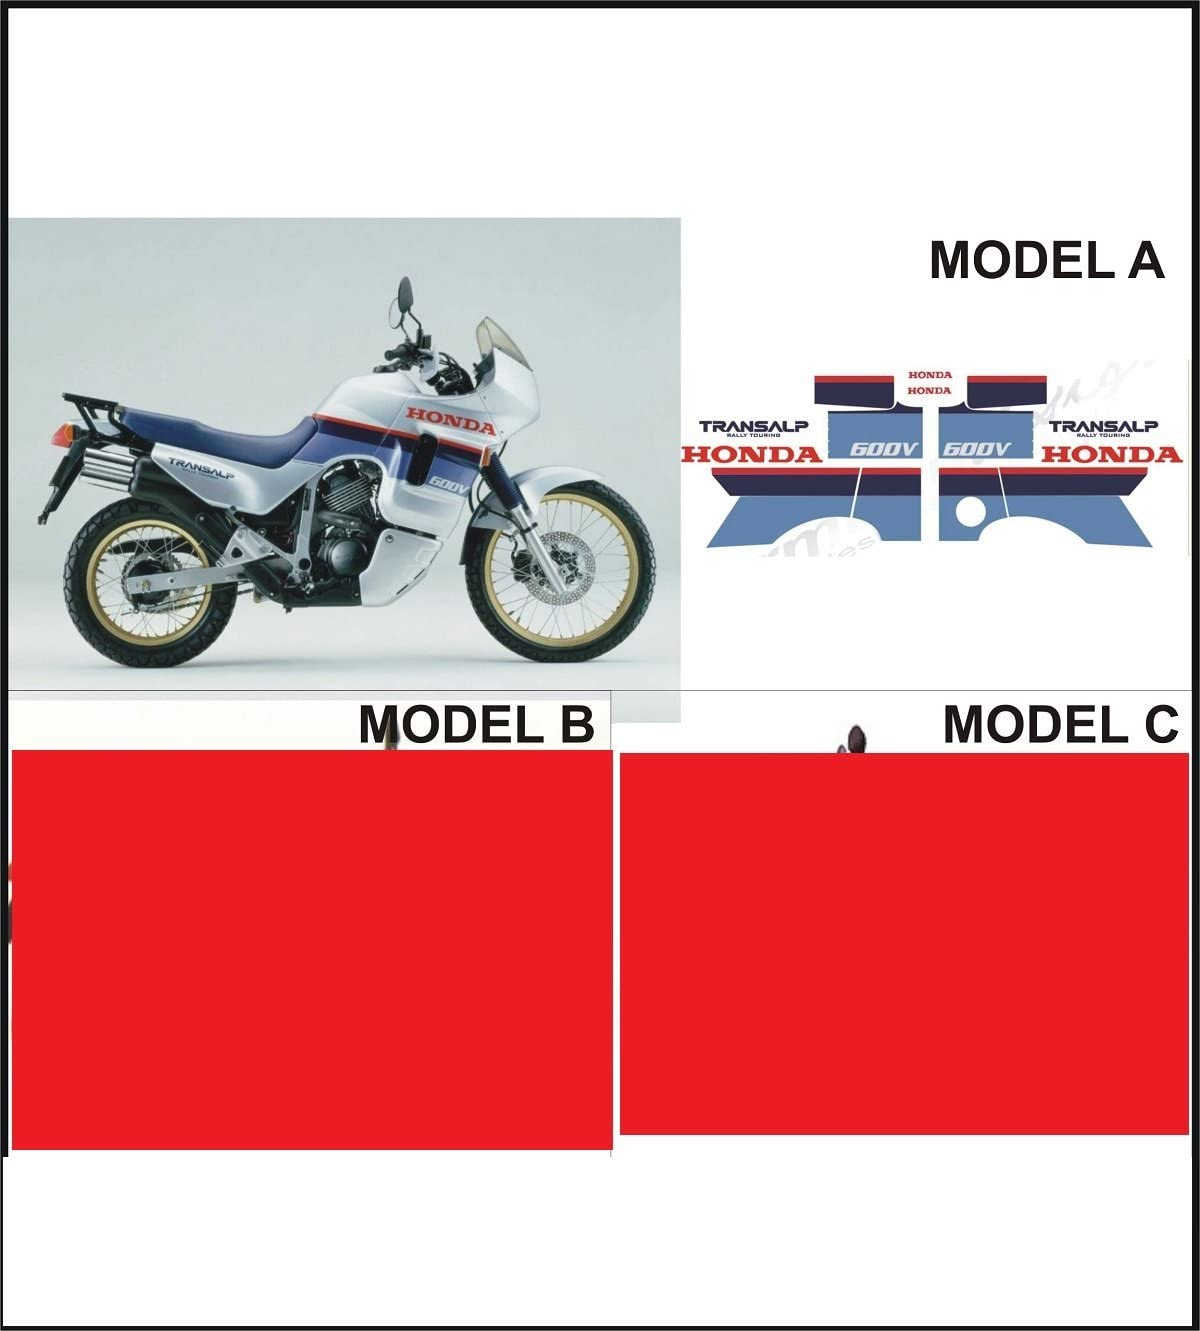 Kit Pegatinas Decal Stickers Honda Transalp XL 600 V 1987 – 1988 Modelo a: Amazon.es: Coche y moto